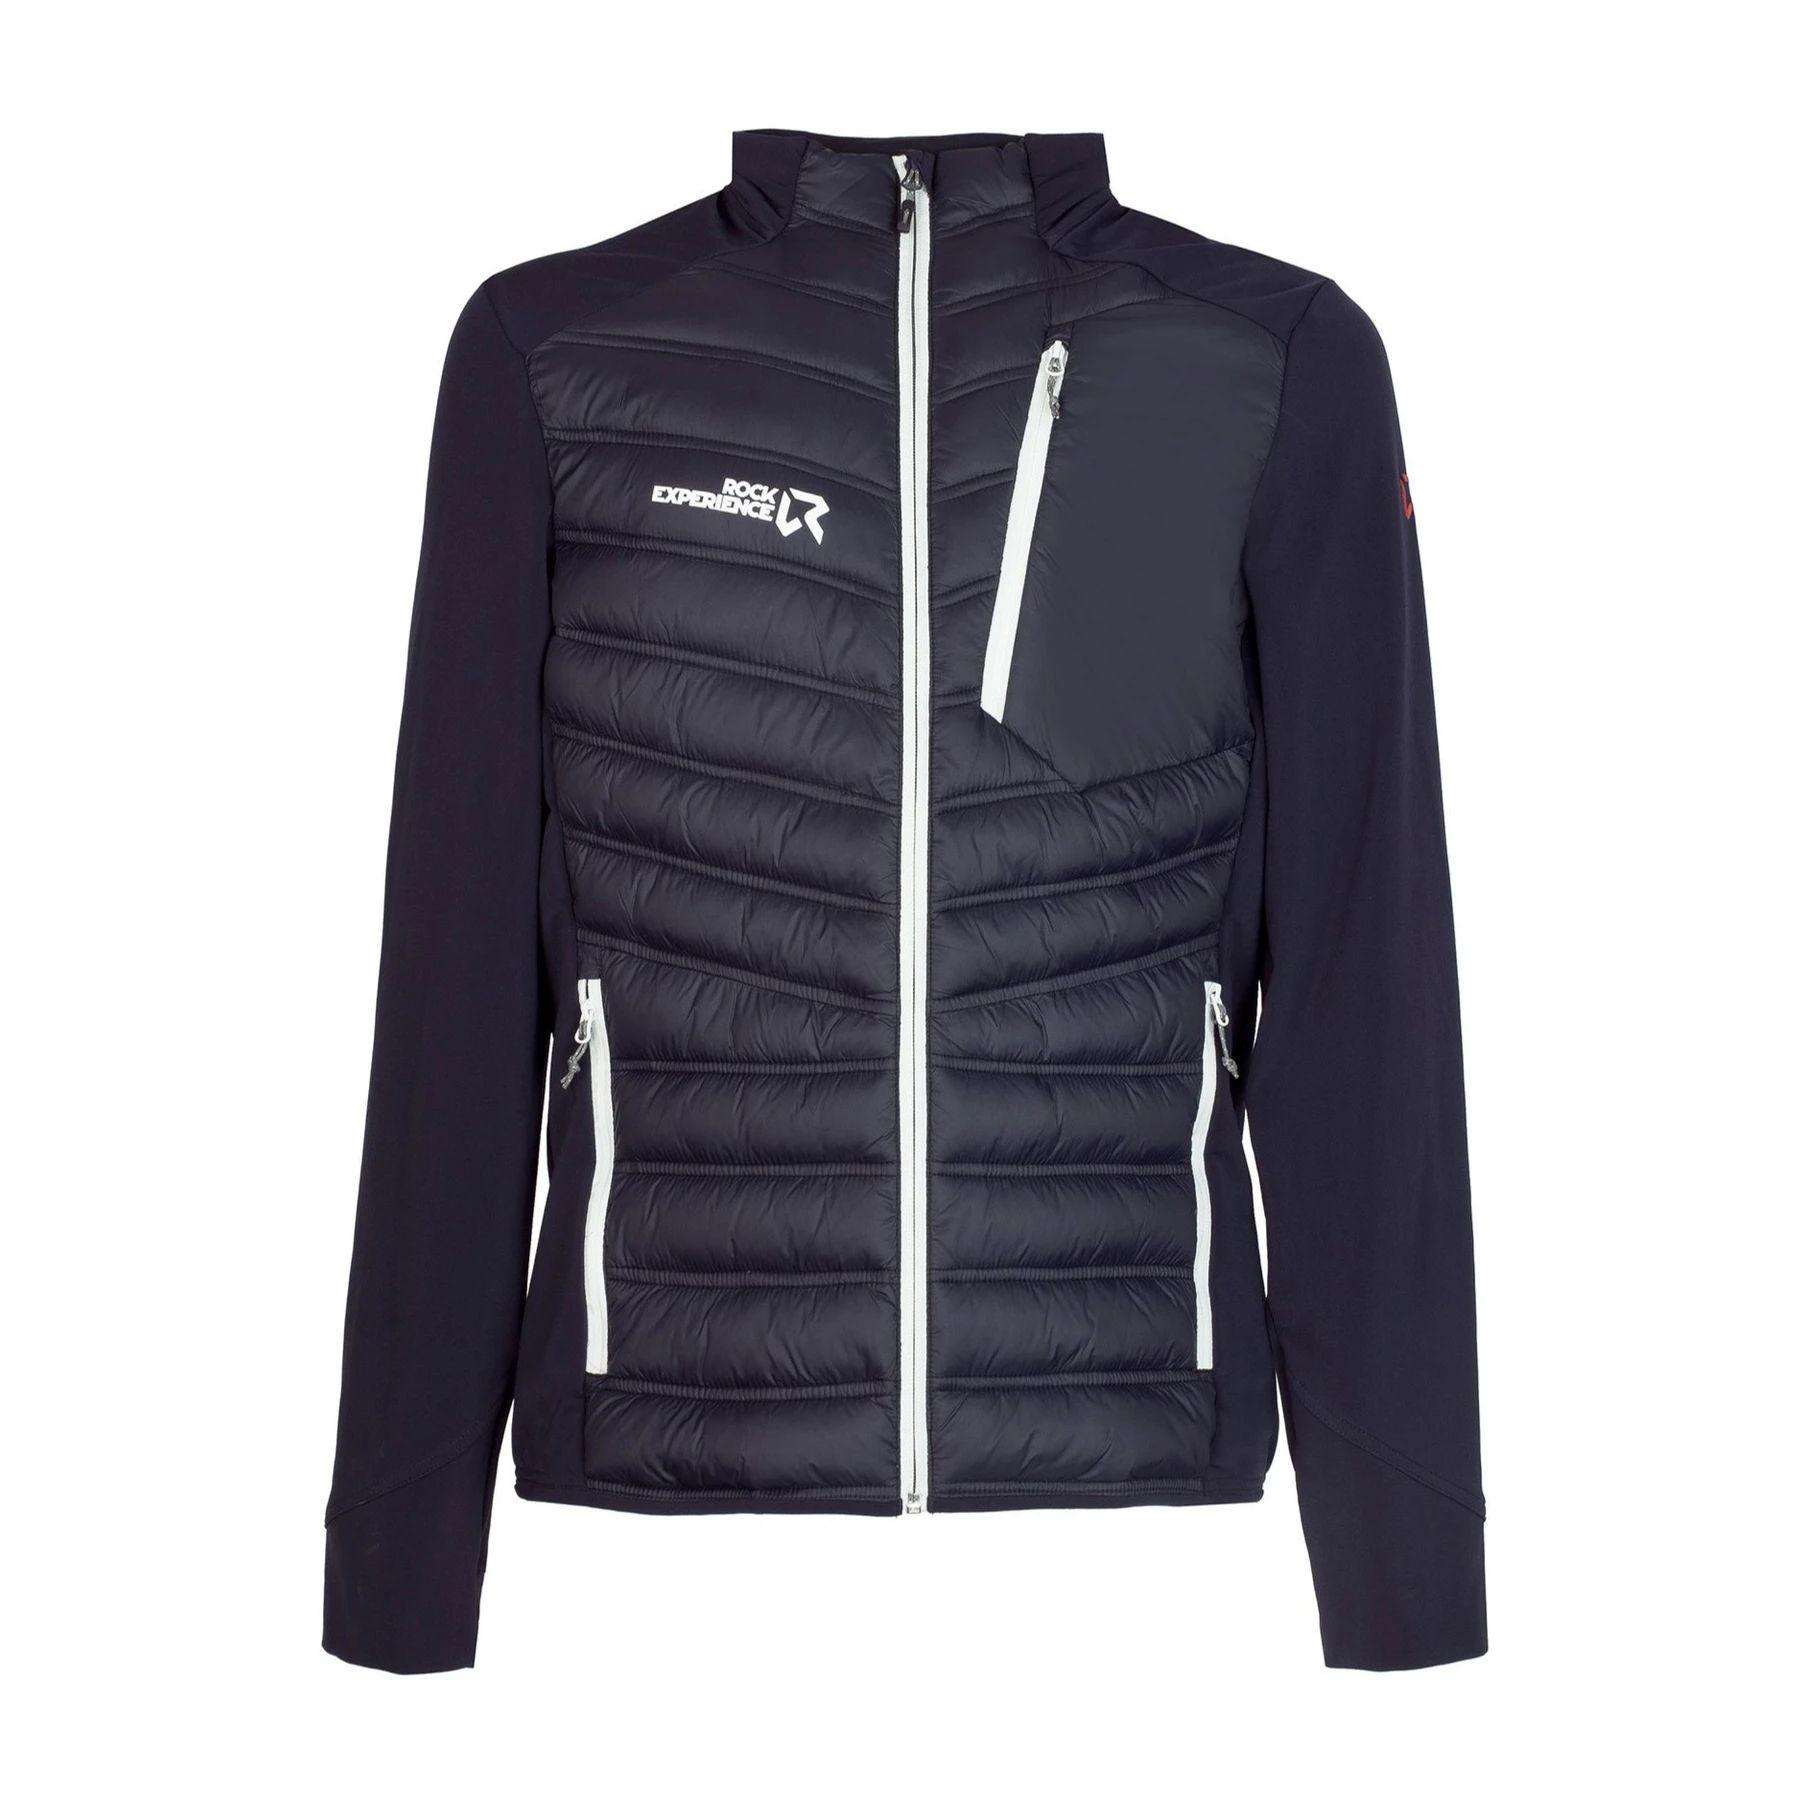 Clothing -  rock experience Parker men hybrid jacket